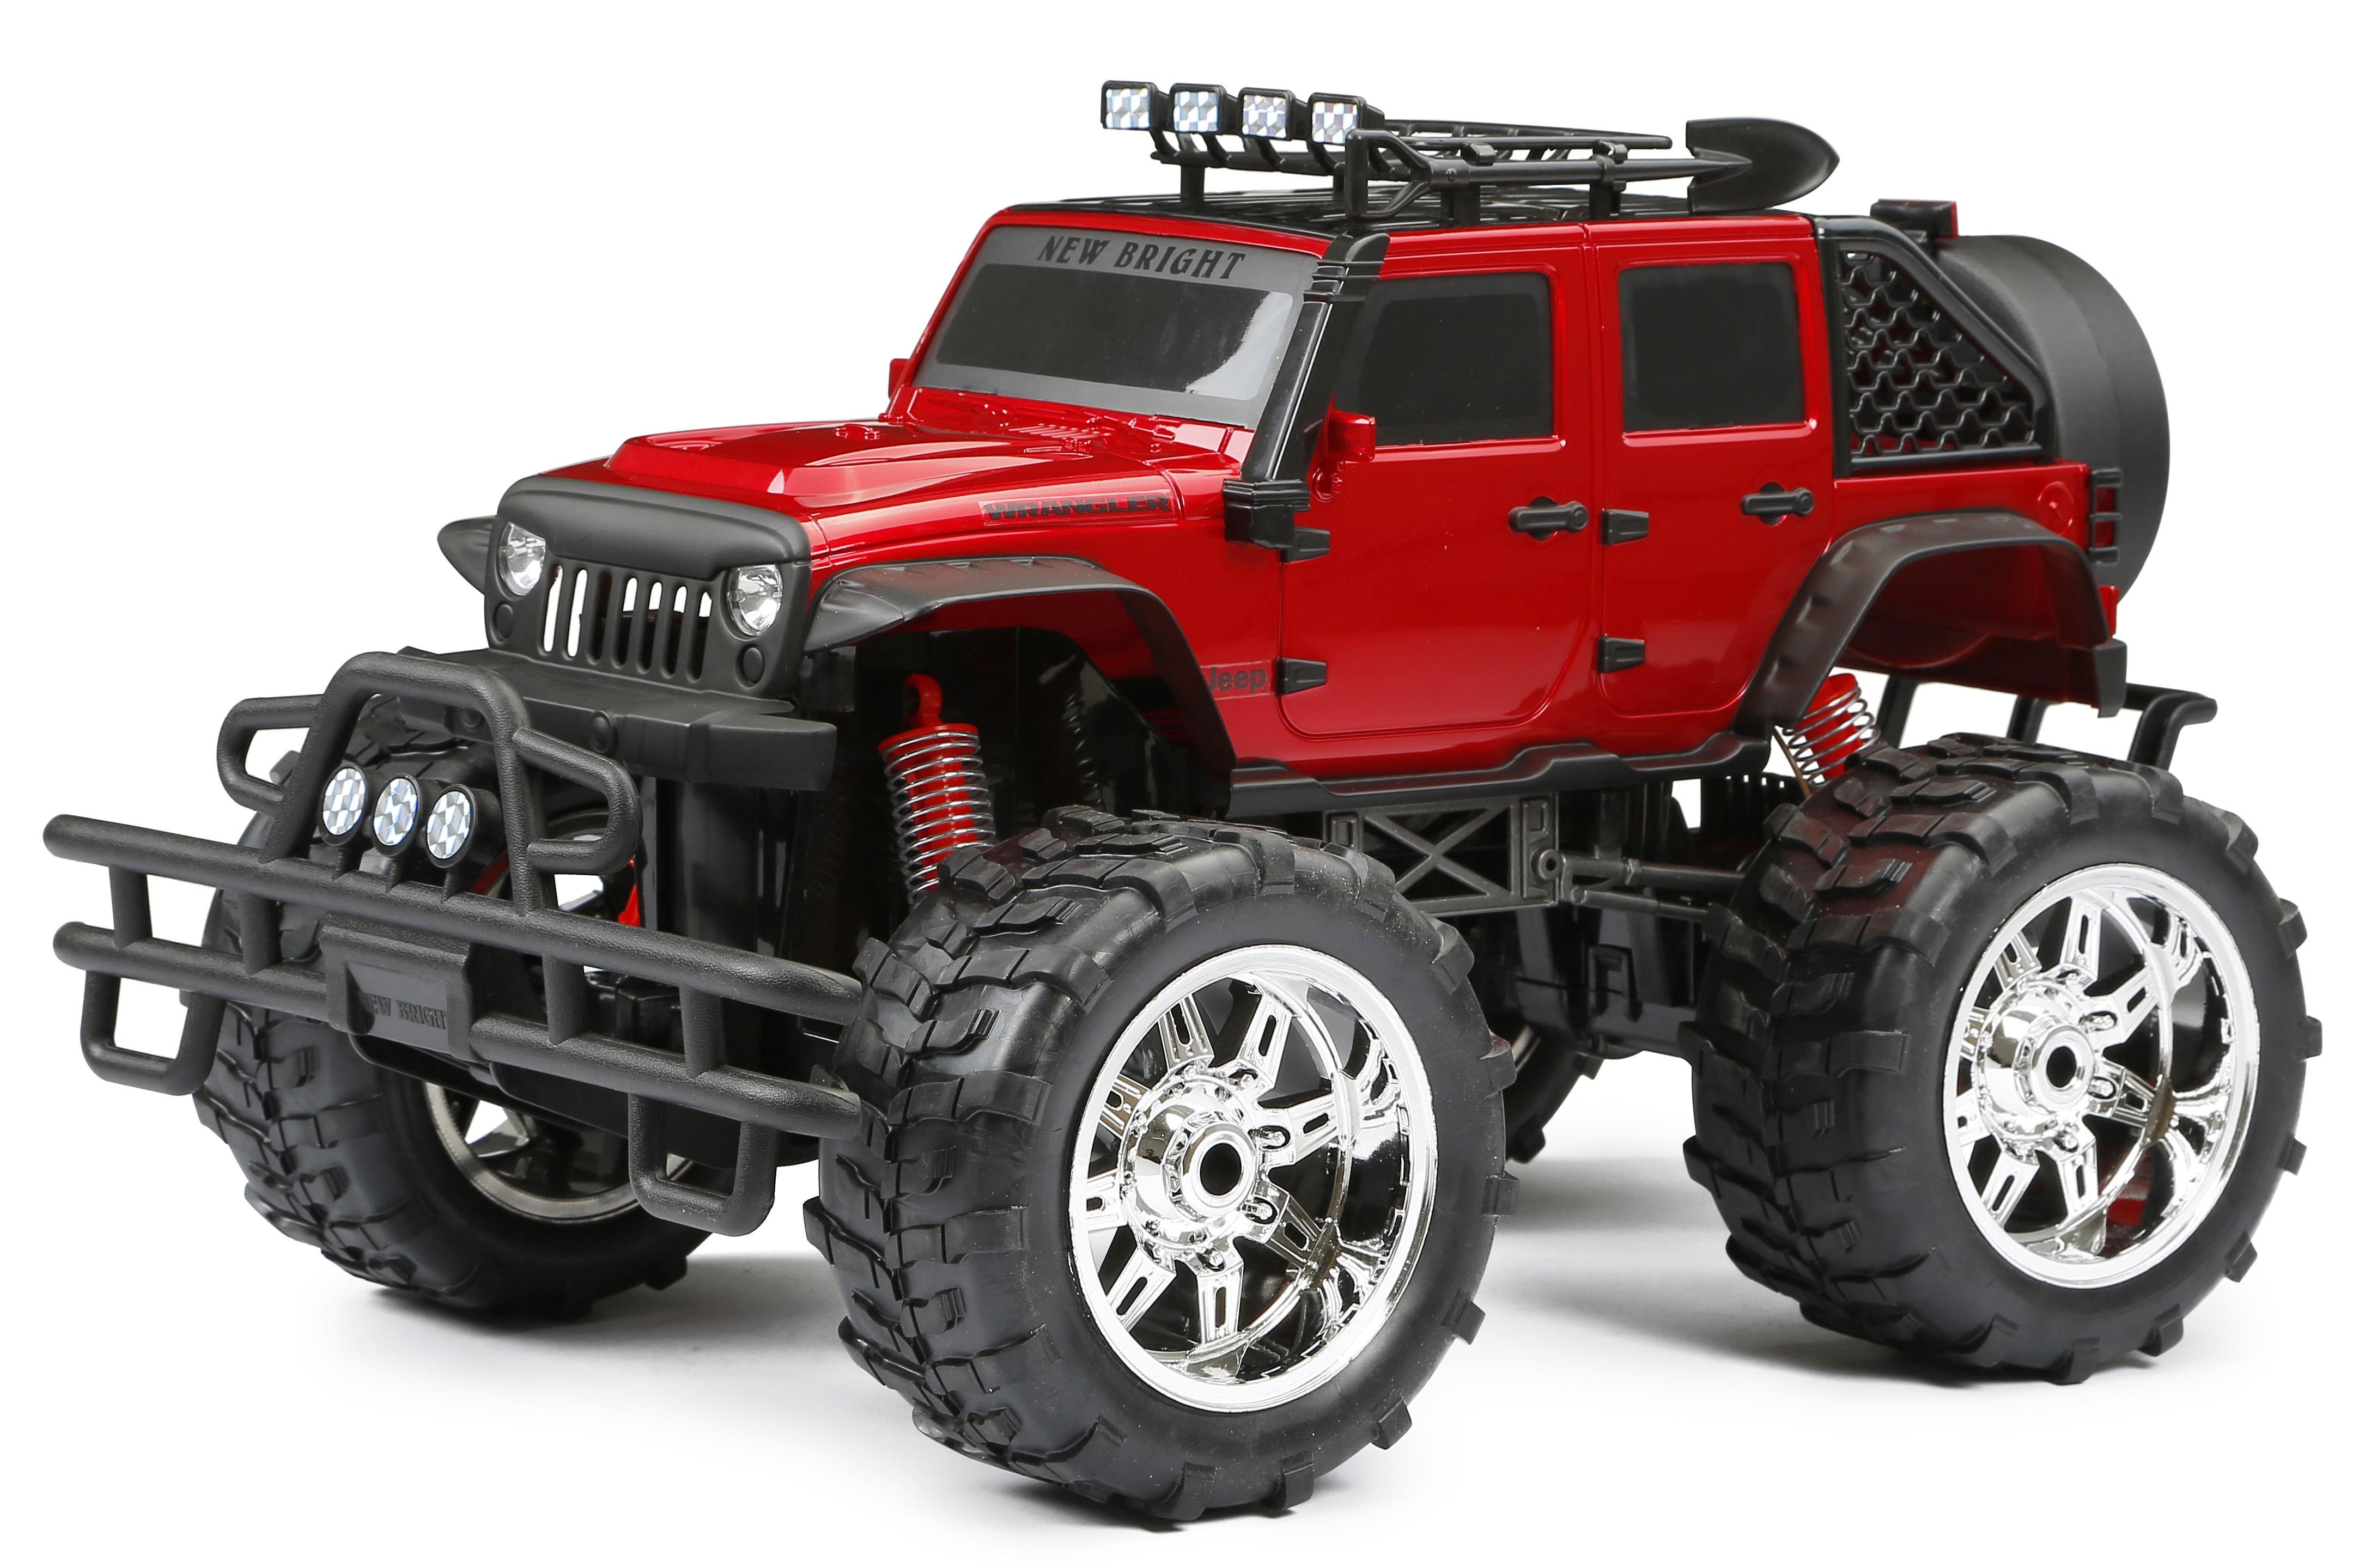 New Bright 1 10 Scale Jeep Wrangler 4 Door Radio Control Jeep Walmart Com Walmart Com